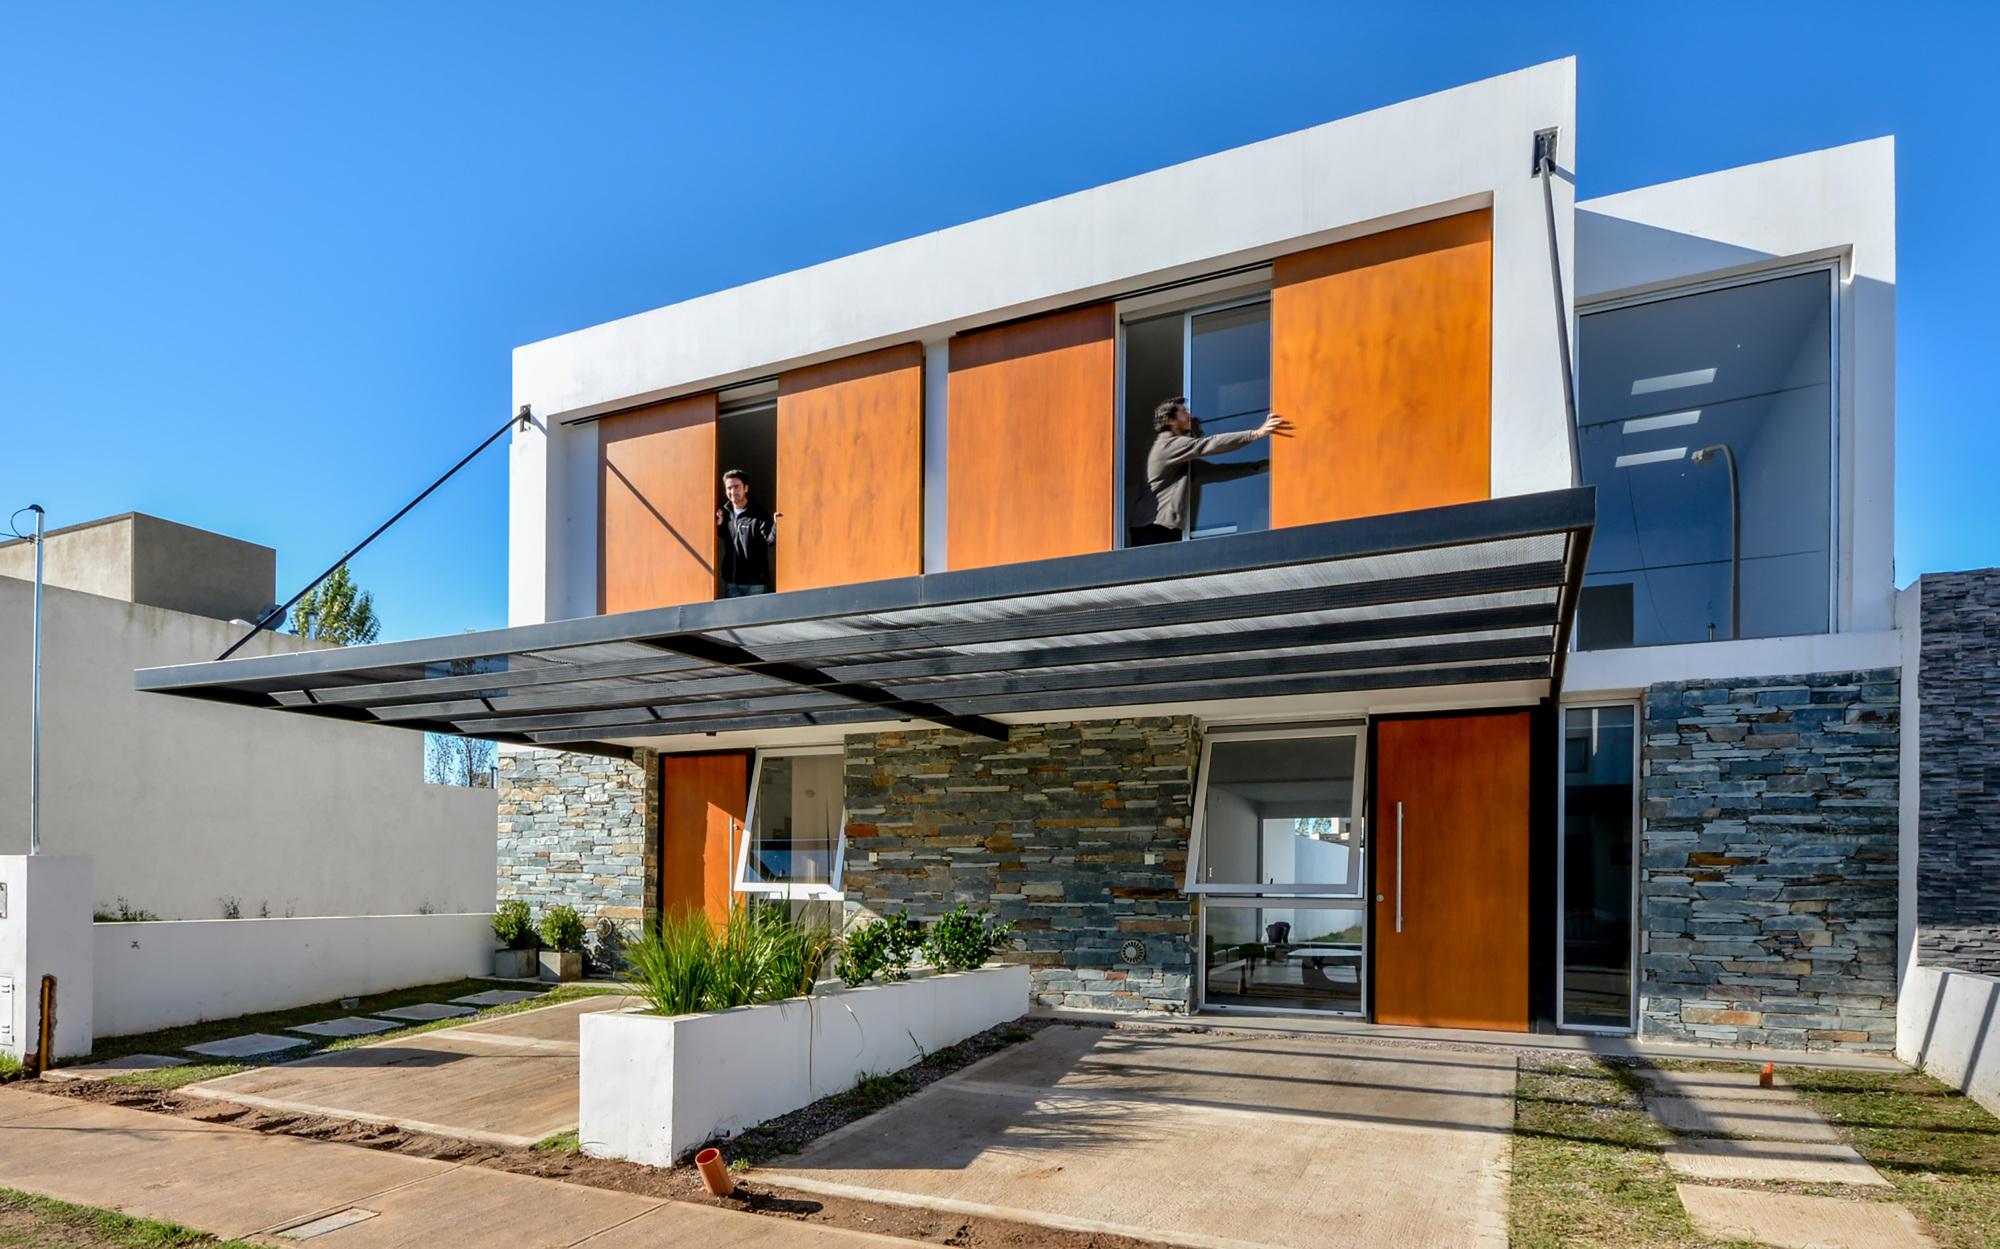 Galeria de casas geminadas estudio a 3 17 for Parasoles arquitectura